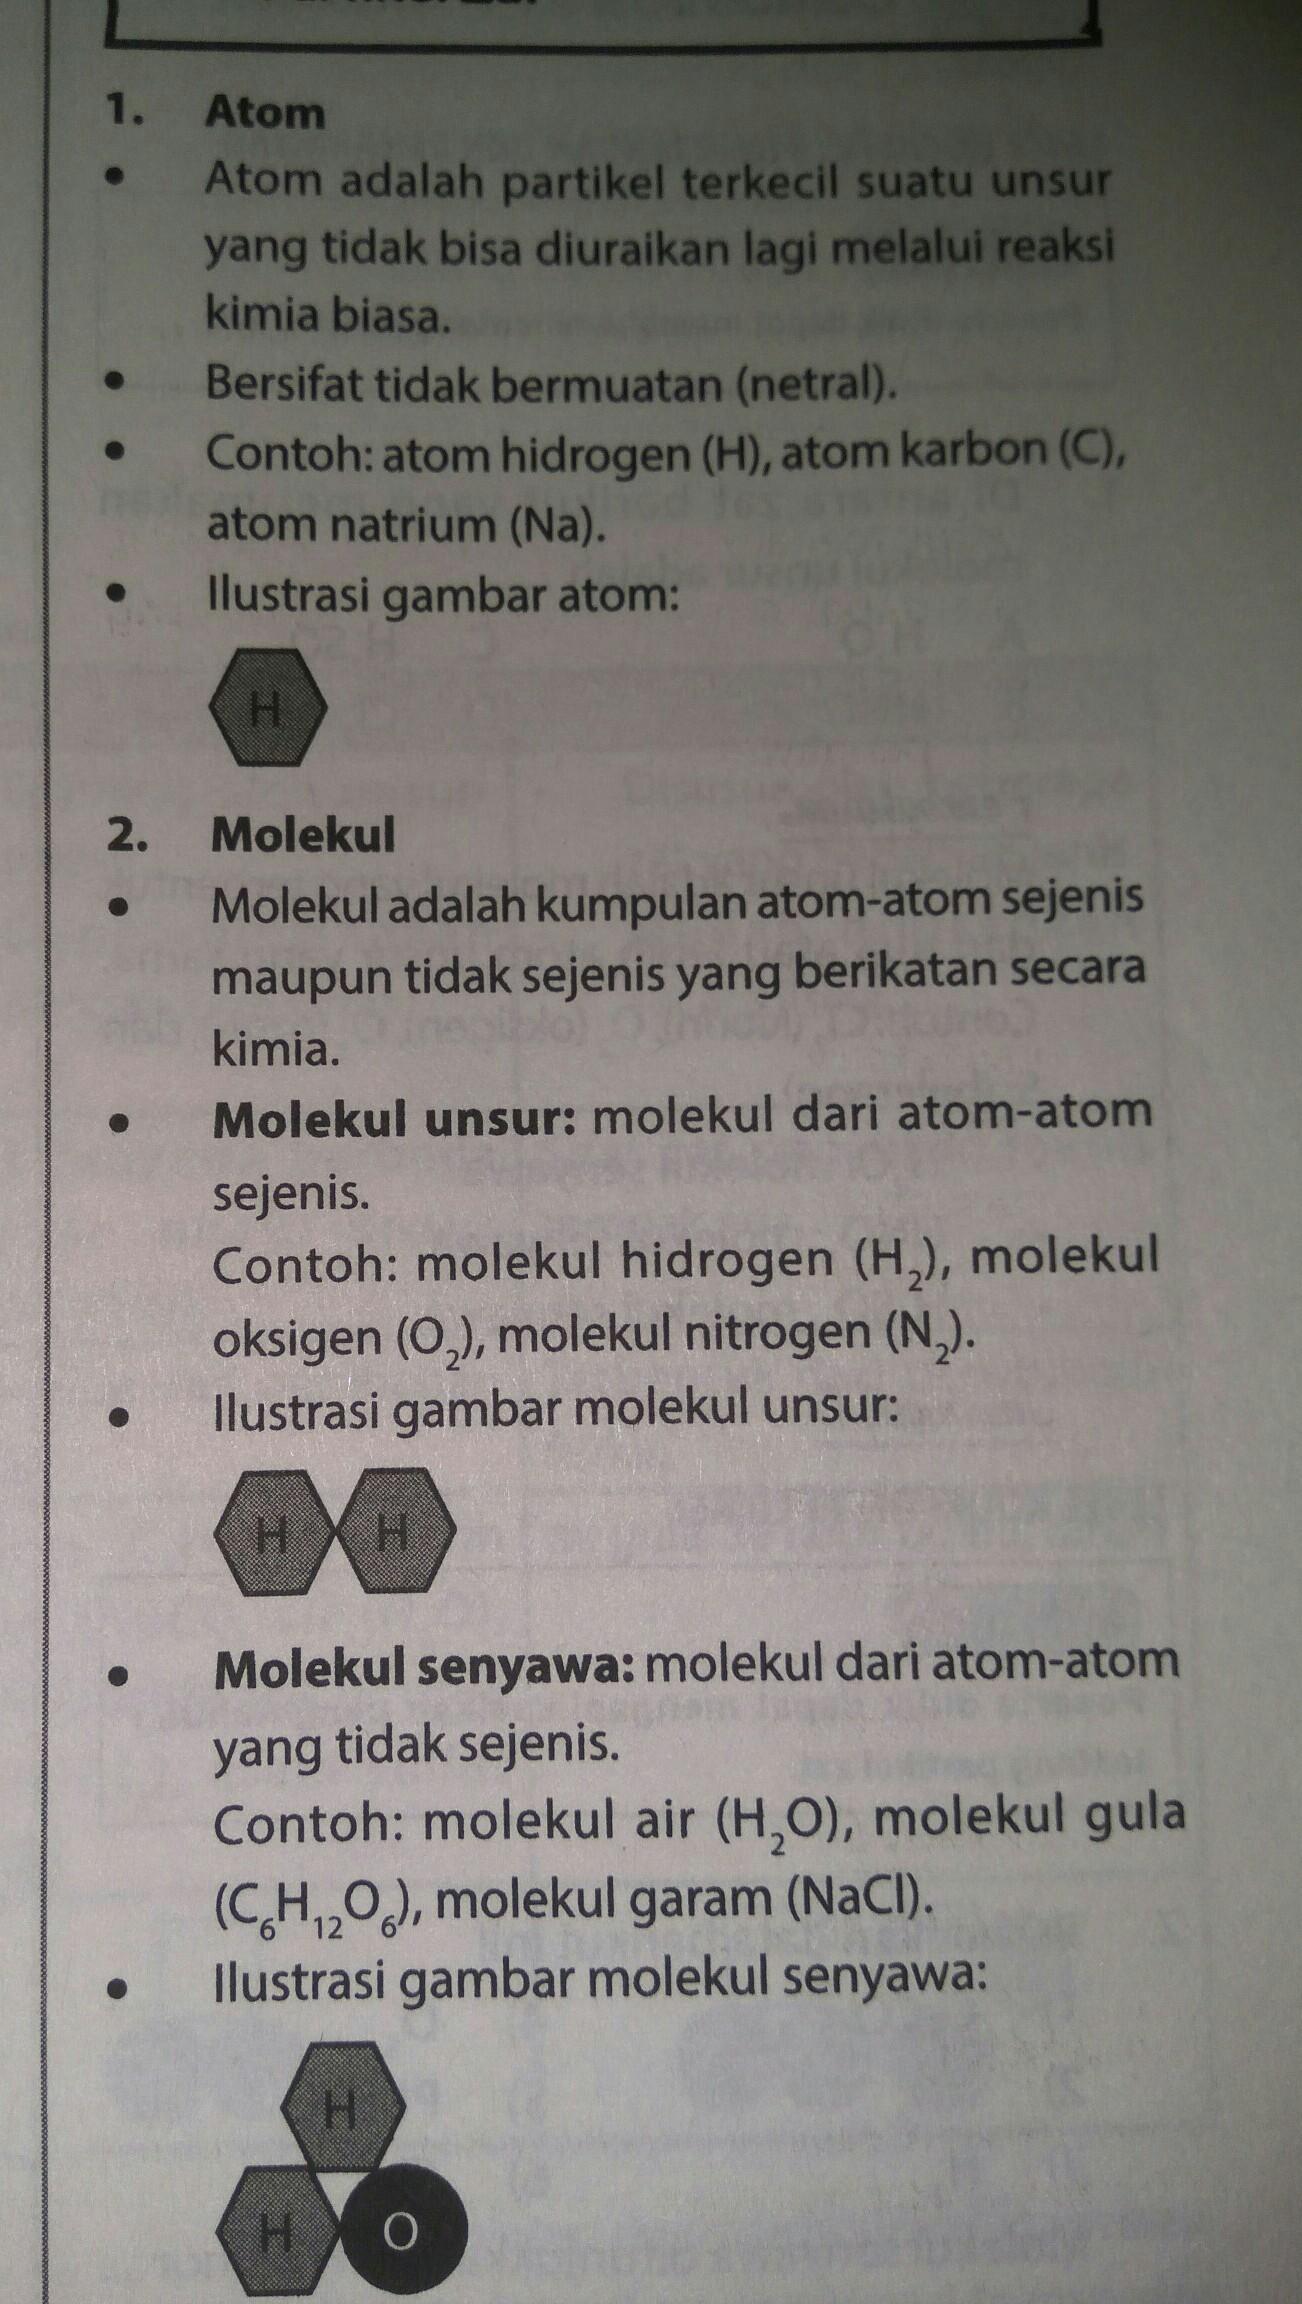 Unsur Gambar Ilustrasi : unsur, gambar, ilustrasi, Contoh, Unsur, Gambar, Ilustrasi, Gambarilus